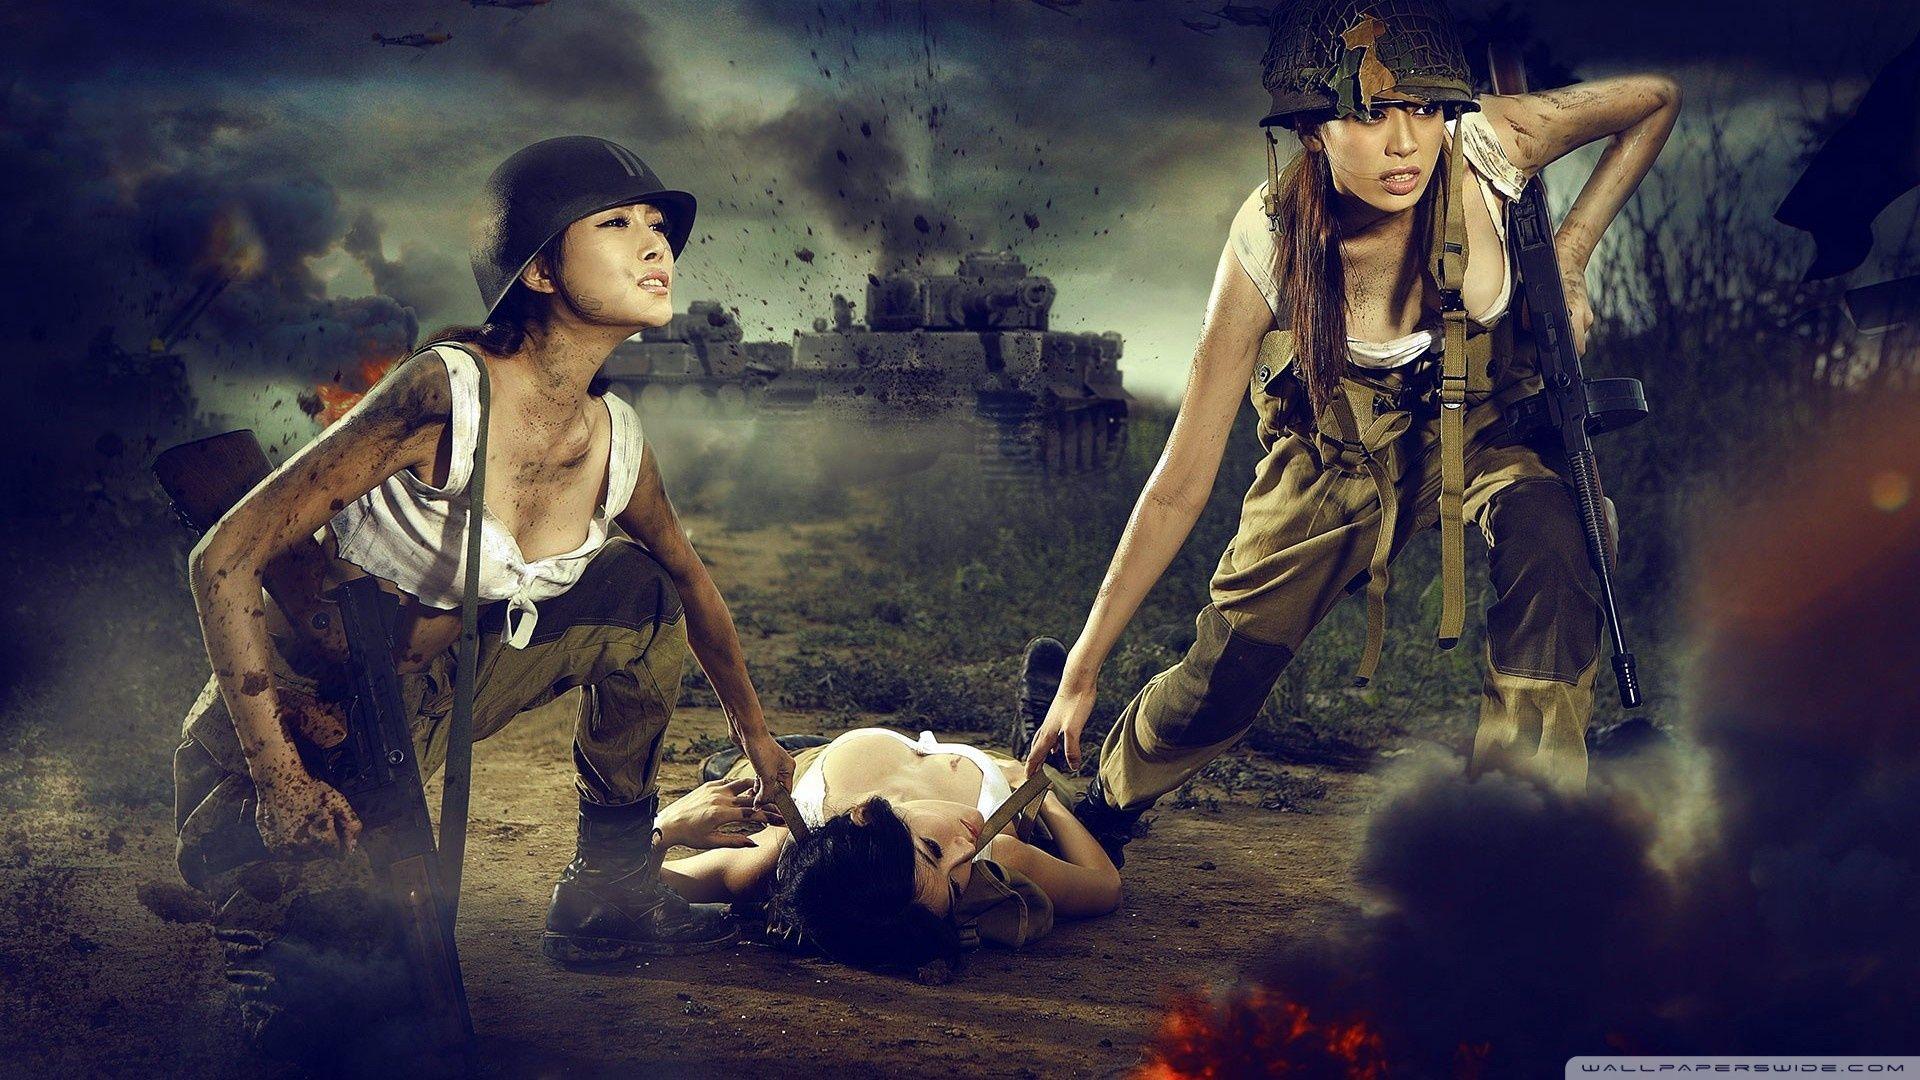 Girl Wallpaper, Army